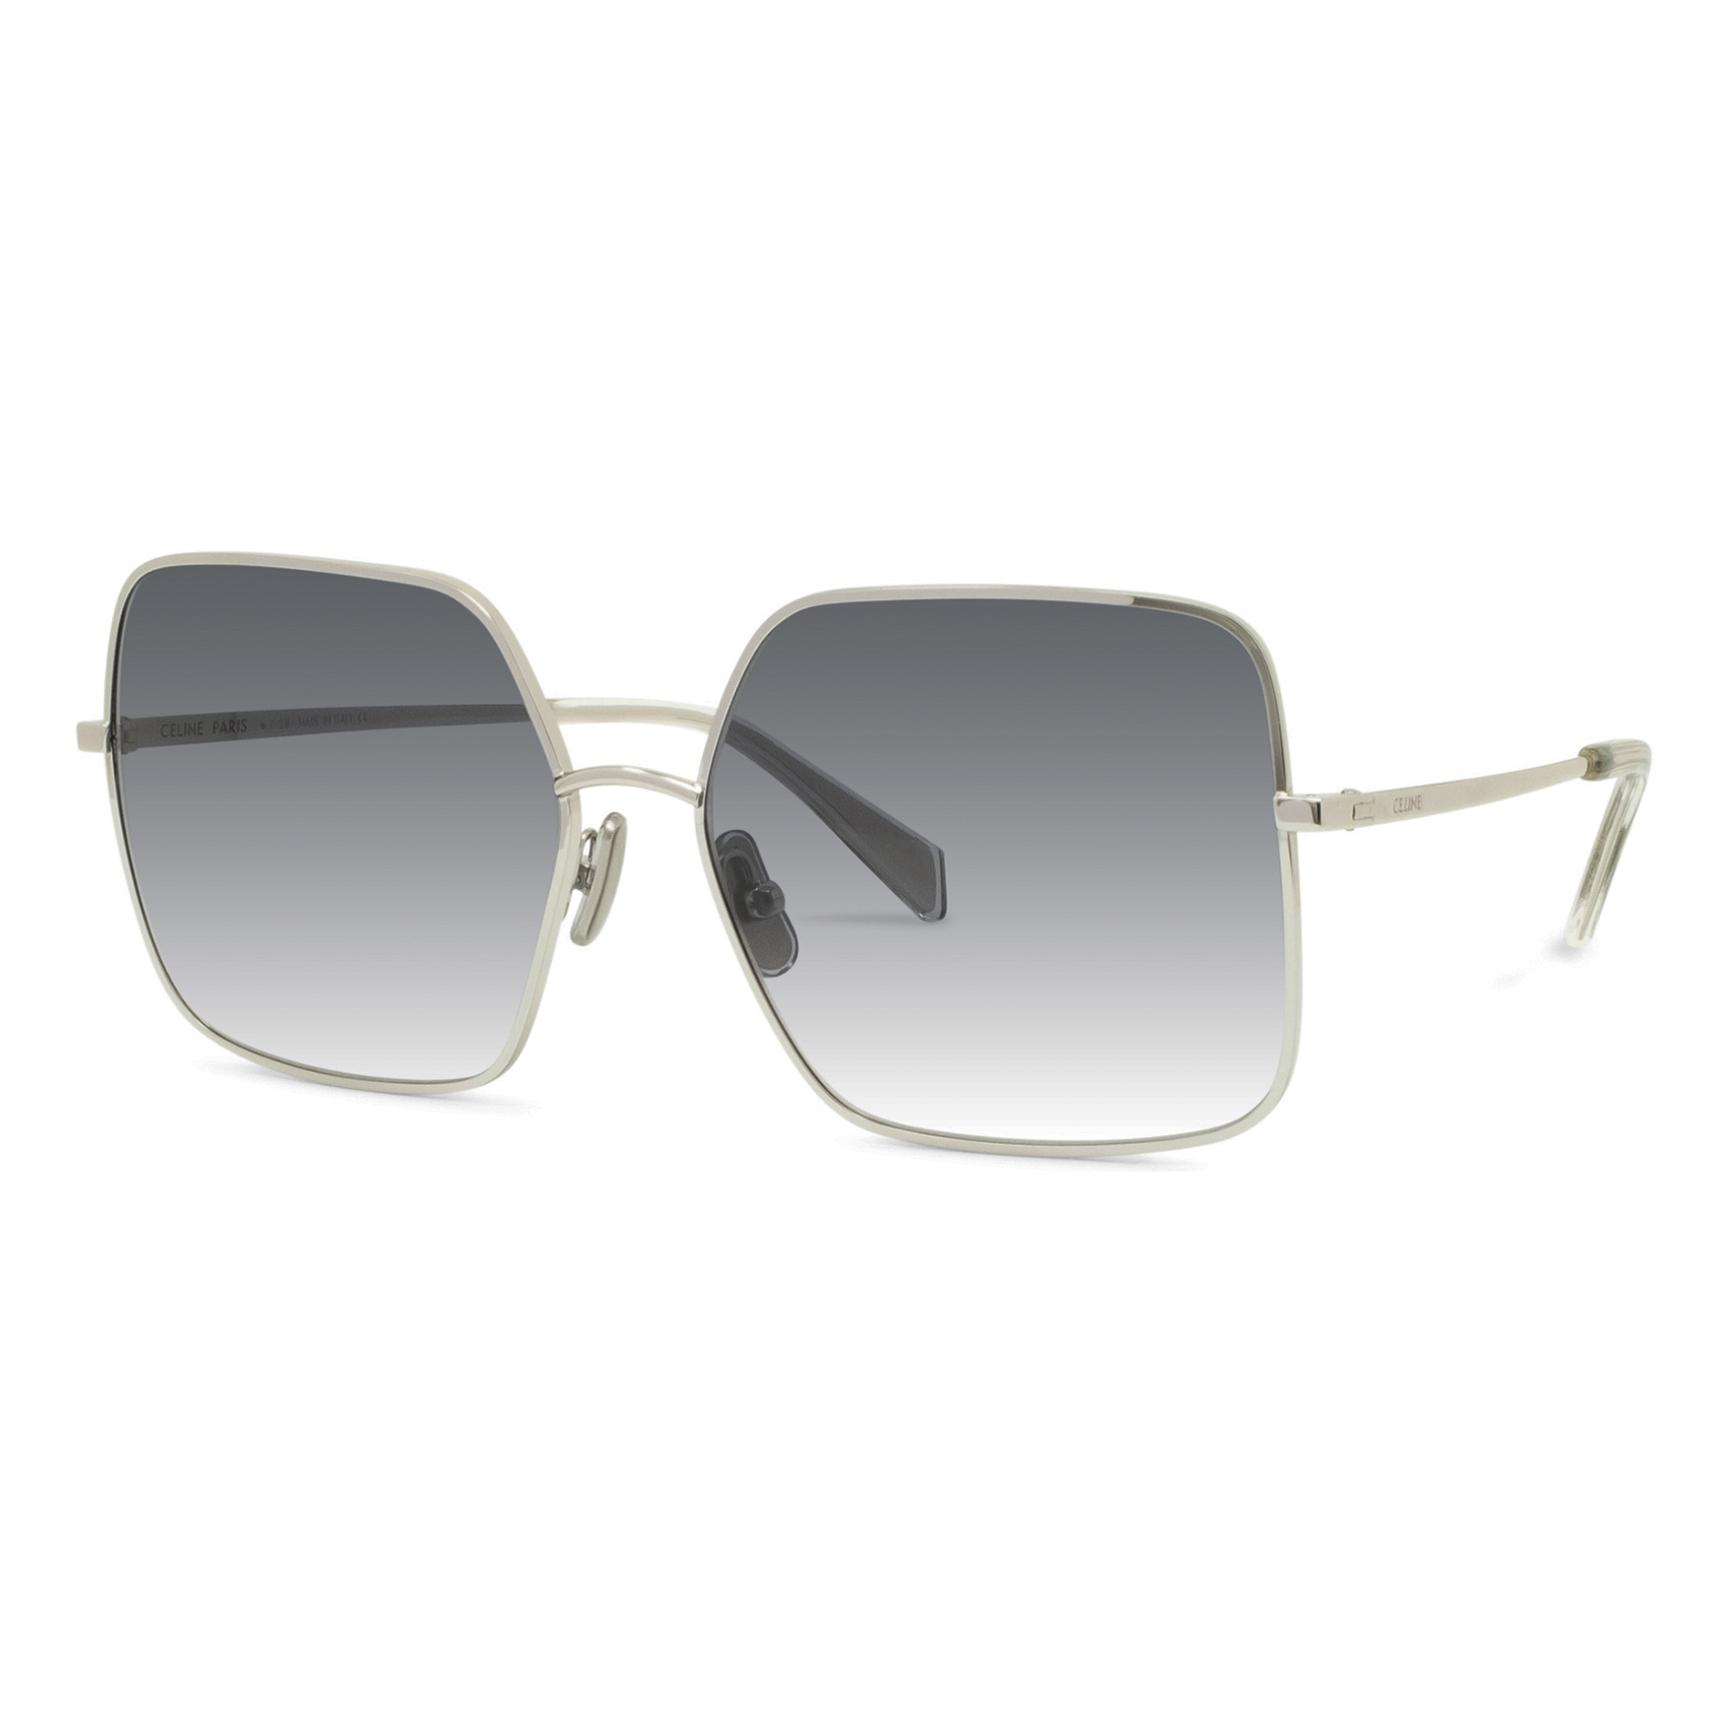 CELINE CL40078U 16W  £290  COLOUR Silver/Gradient Grey  CATEGORY Sunglasses  MATERIAL Metal  SHAPE Square